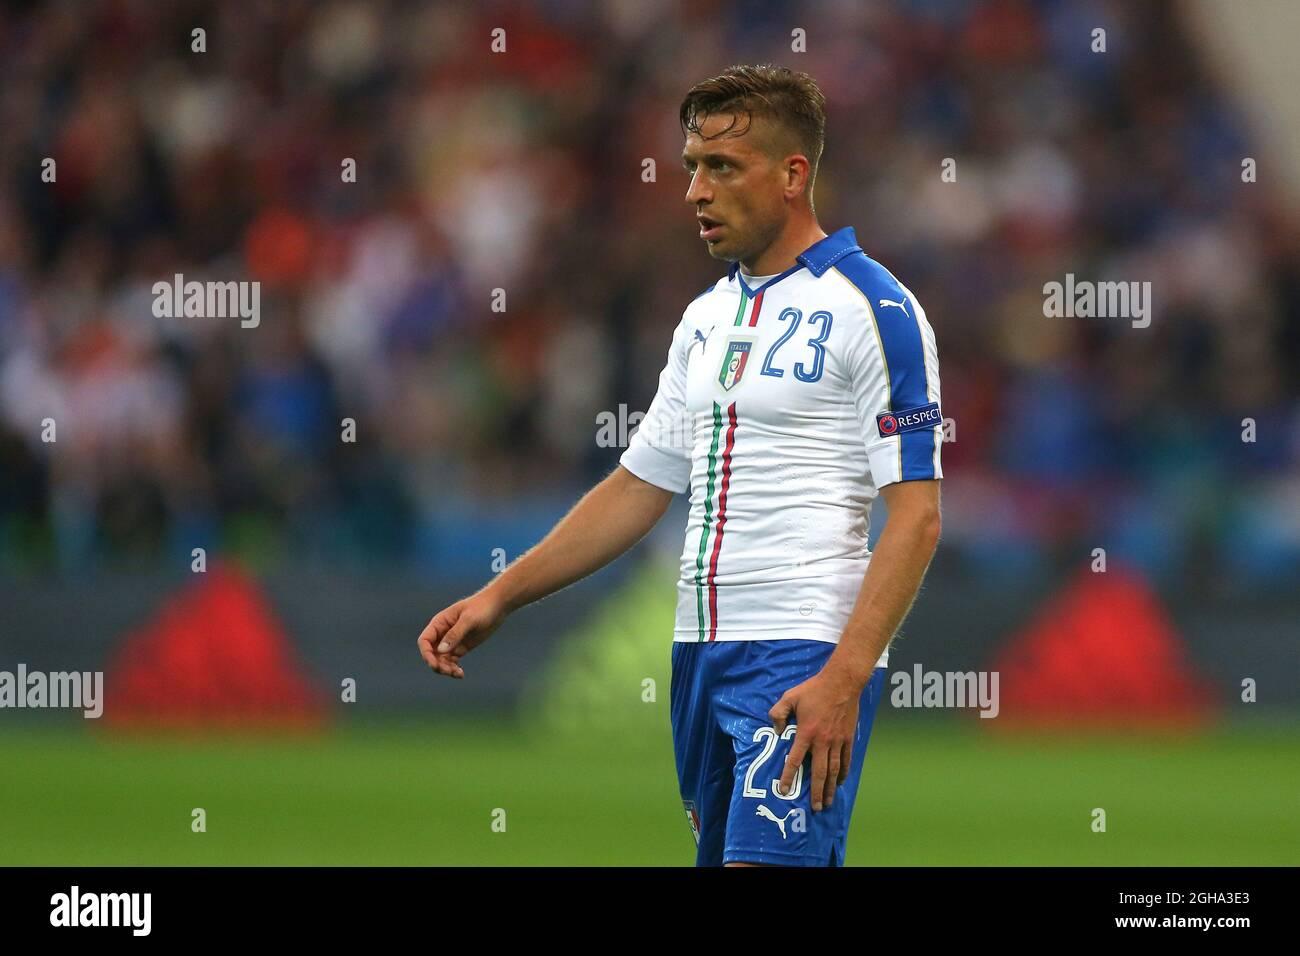 Emanuele Giaccherini aus Italien während des Spiels der  UEFA-Europameisterschaft 2016 im Stade de Lyon, Lyon. Bilddatum 13. Juni  2016 Pic Phil Oldham/Sportimage via PA Images Stockfotografie - Alamy